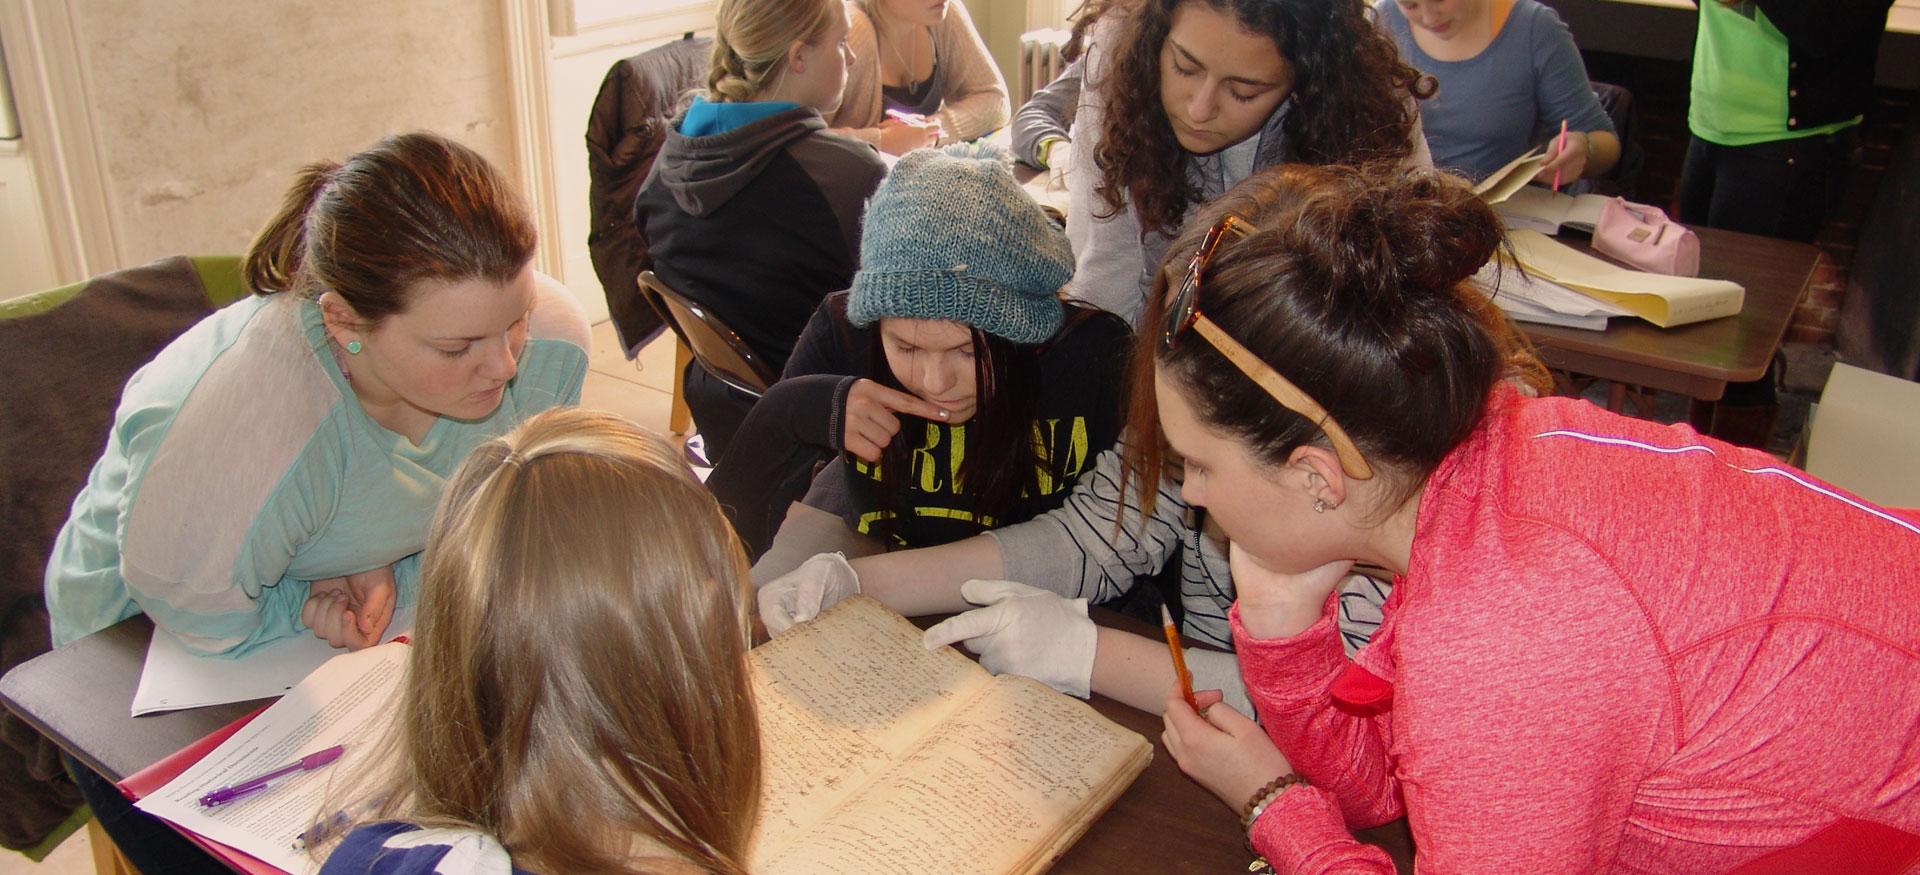 History education at Freeport Historical Society